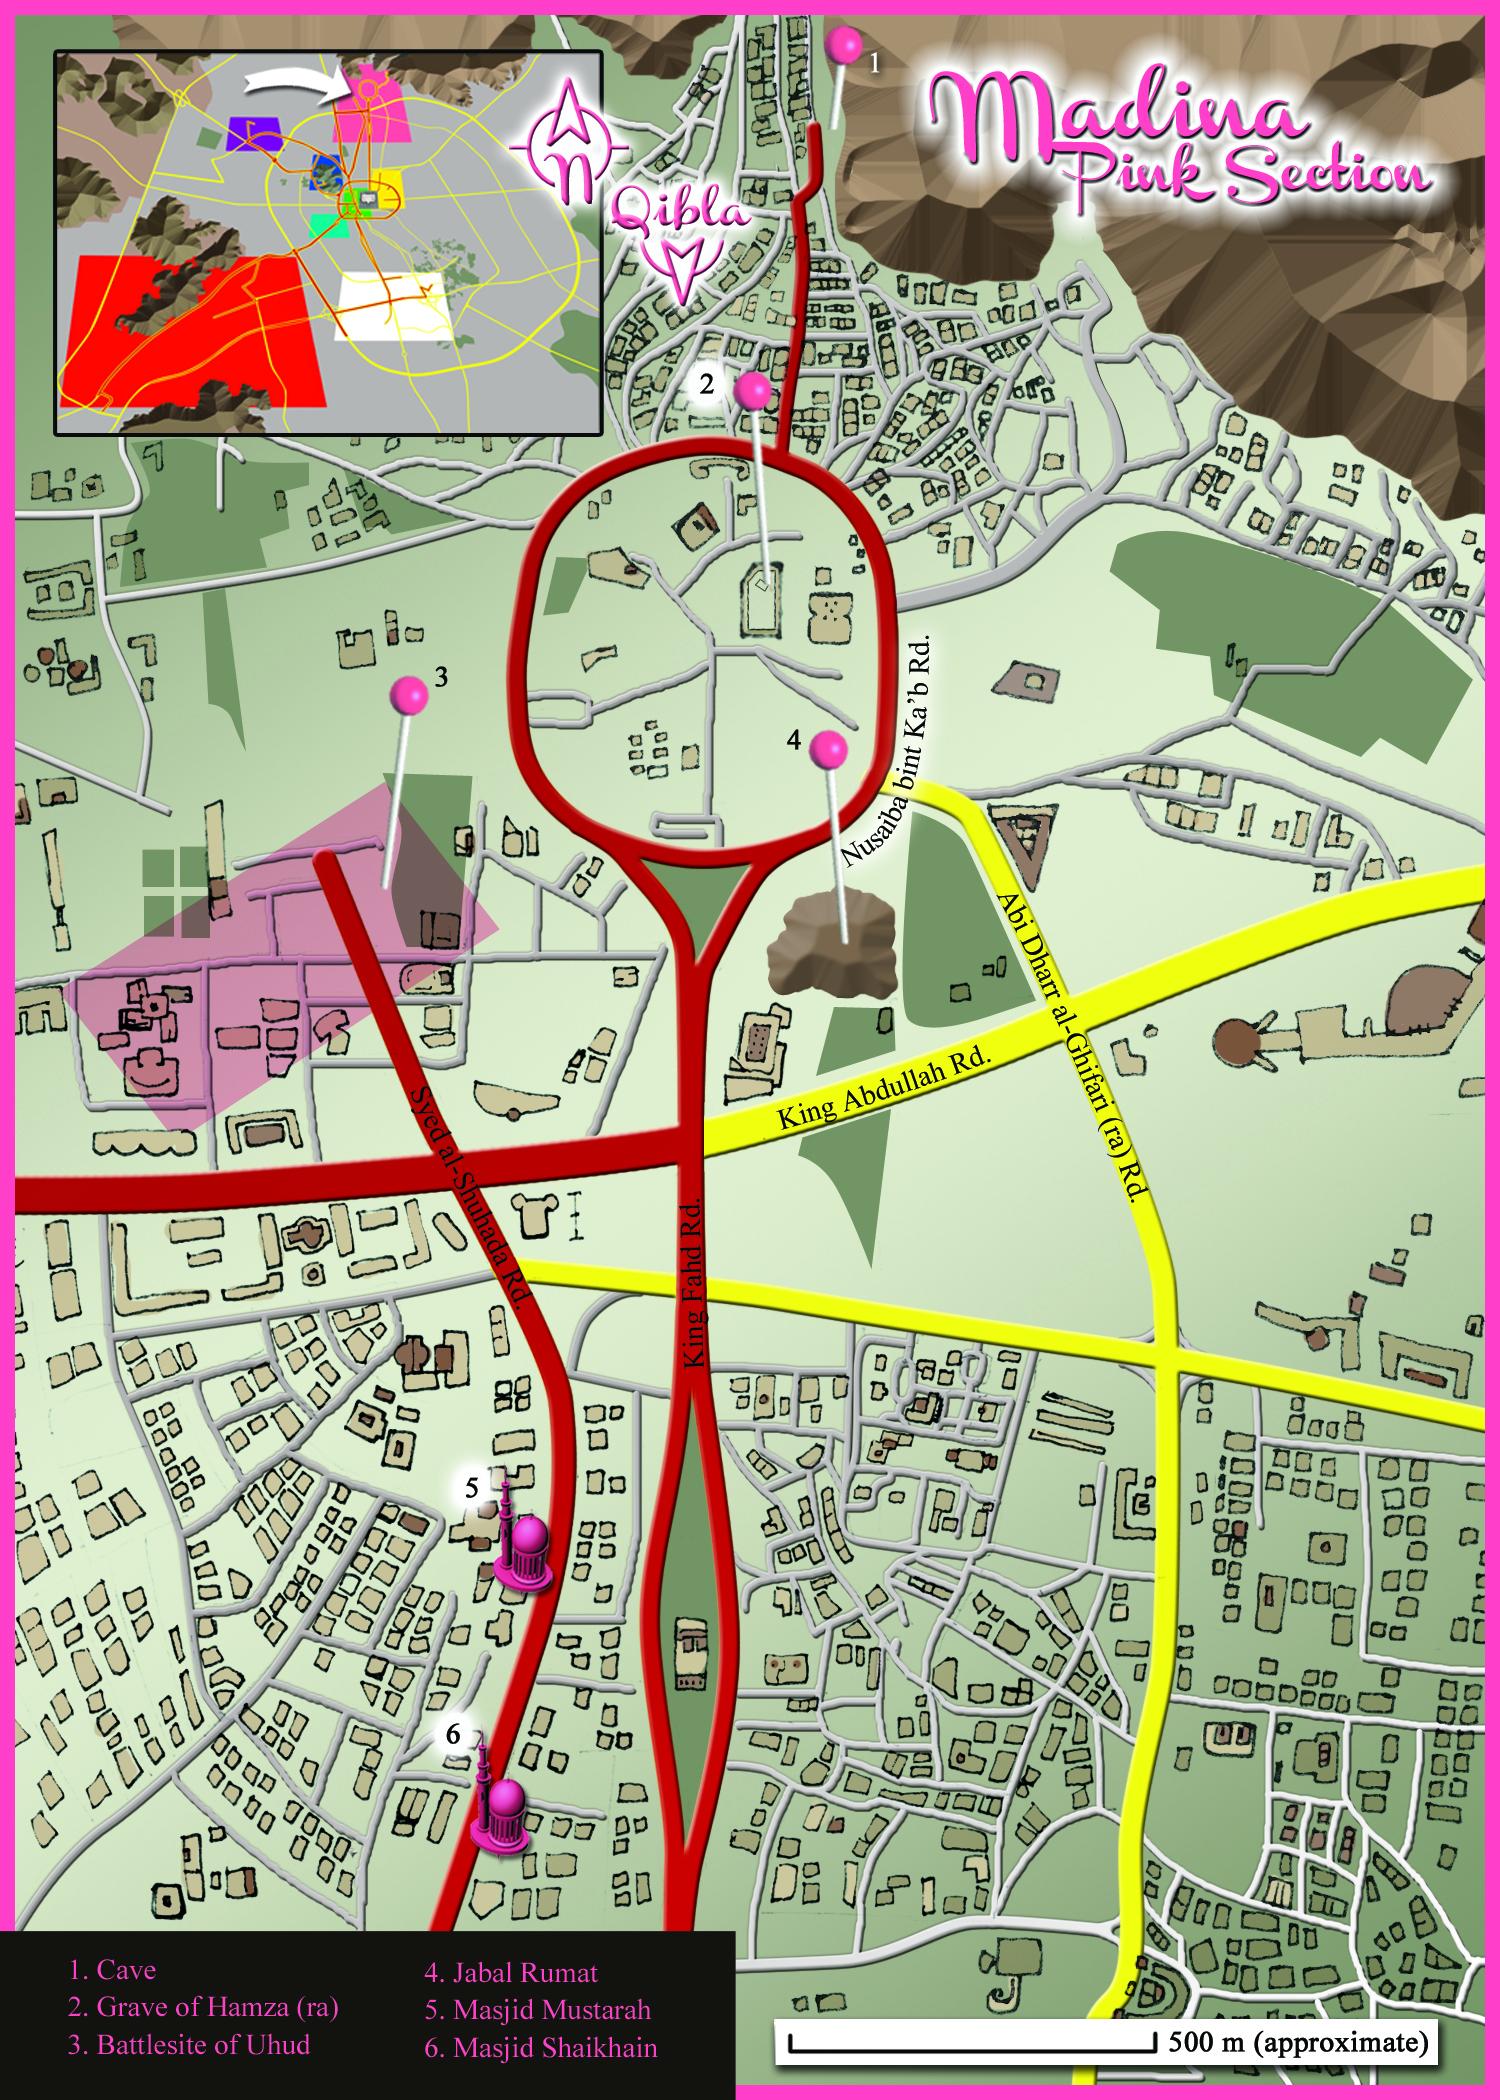 Medina Map: Pink Section Detail